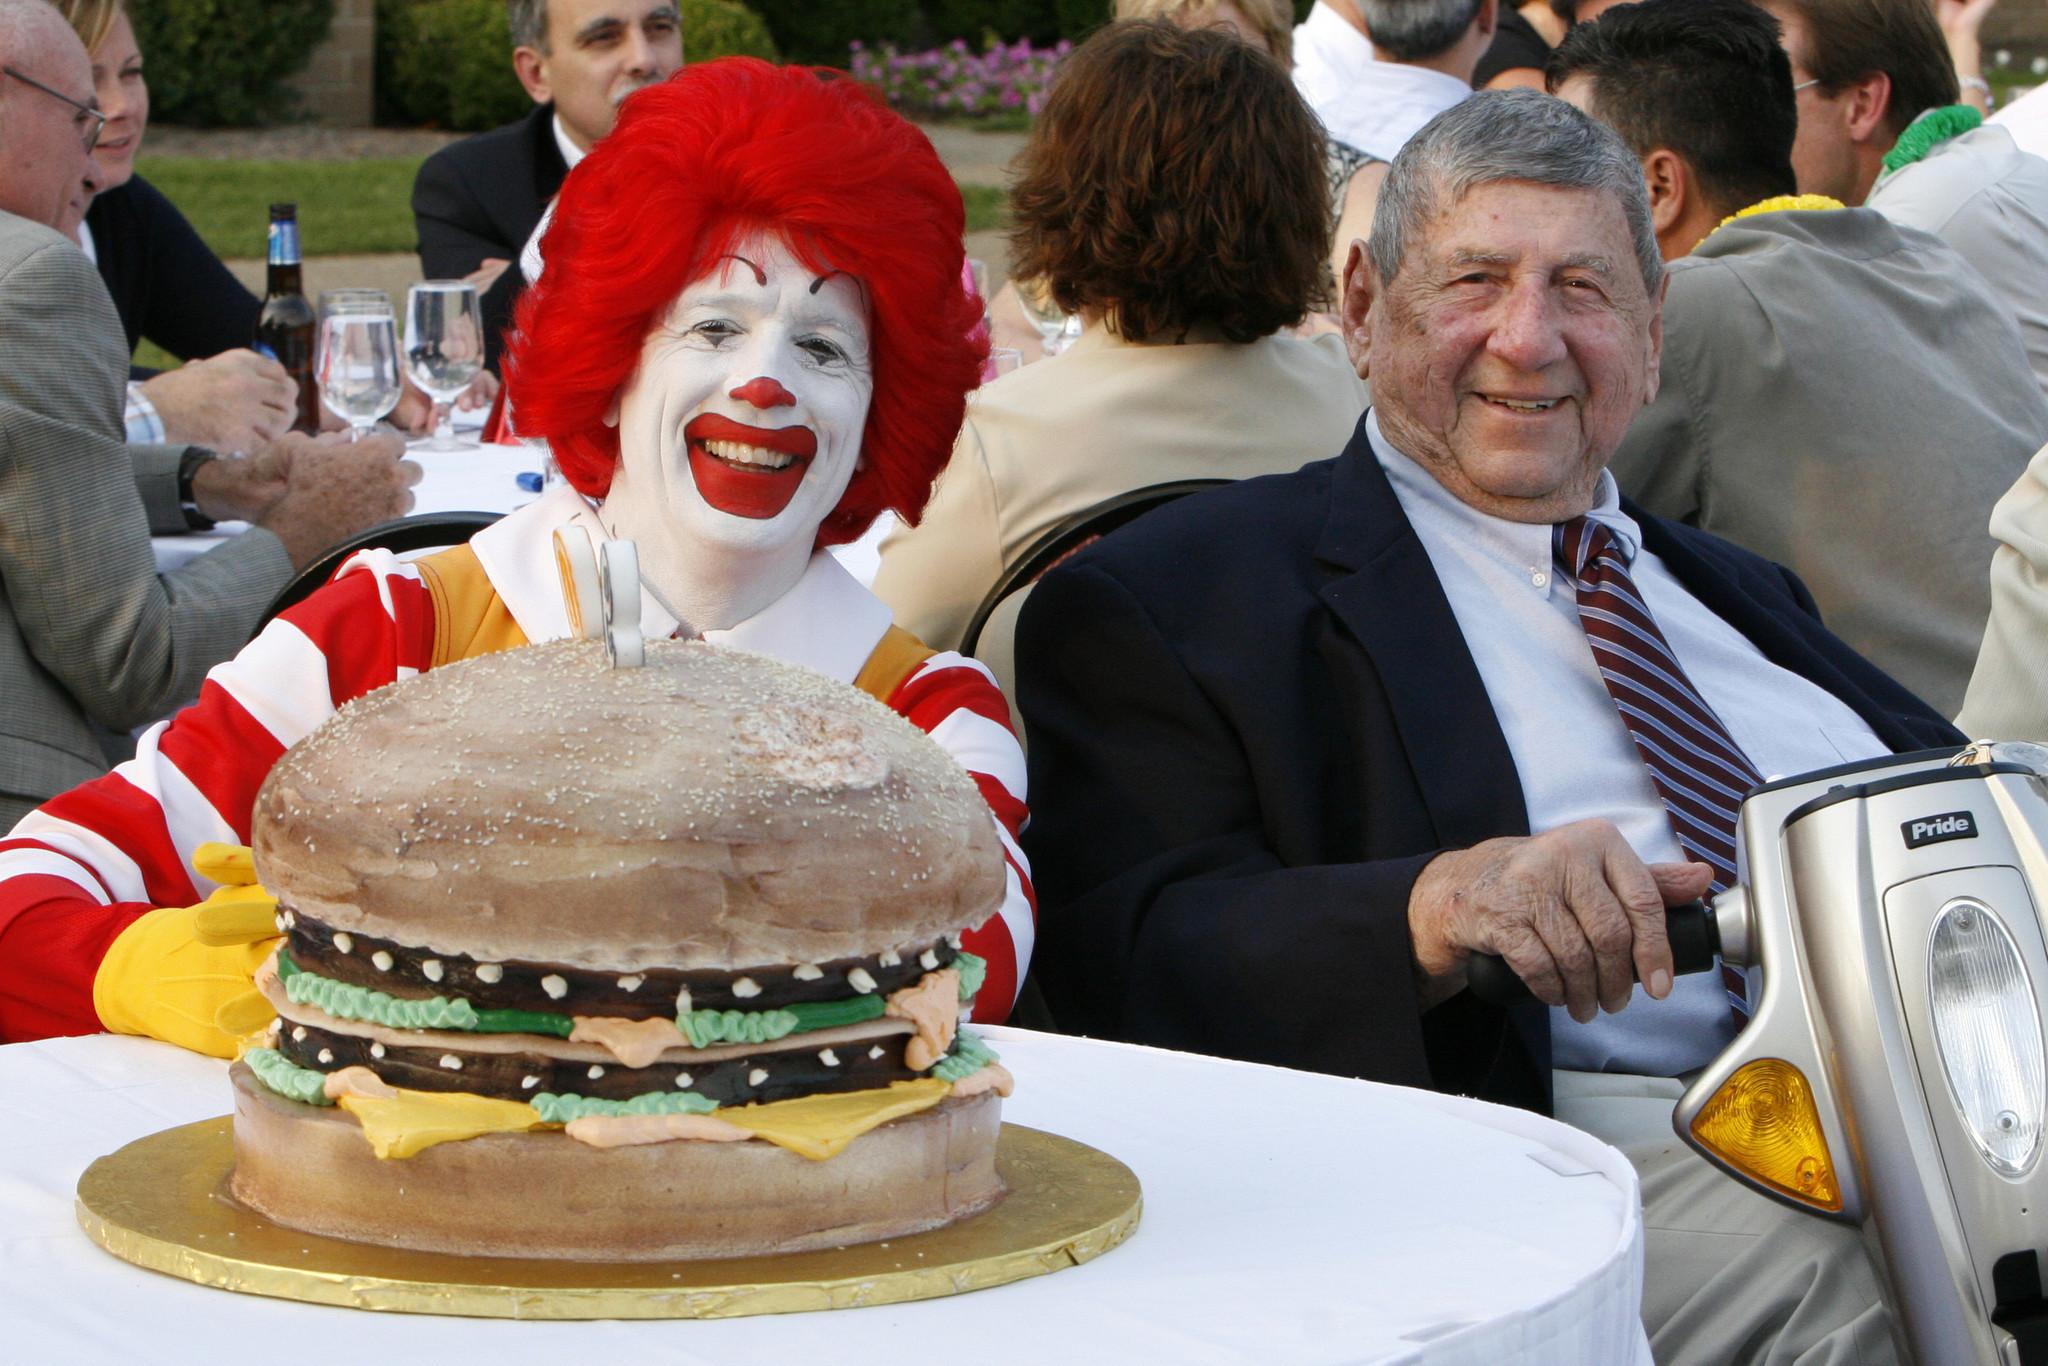 Man who created Big Mac dies at 98 - Chicago Tribune